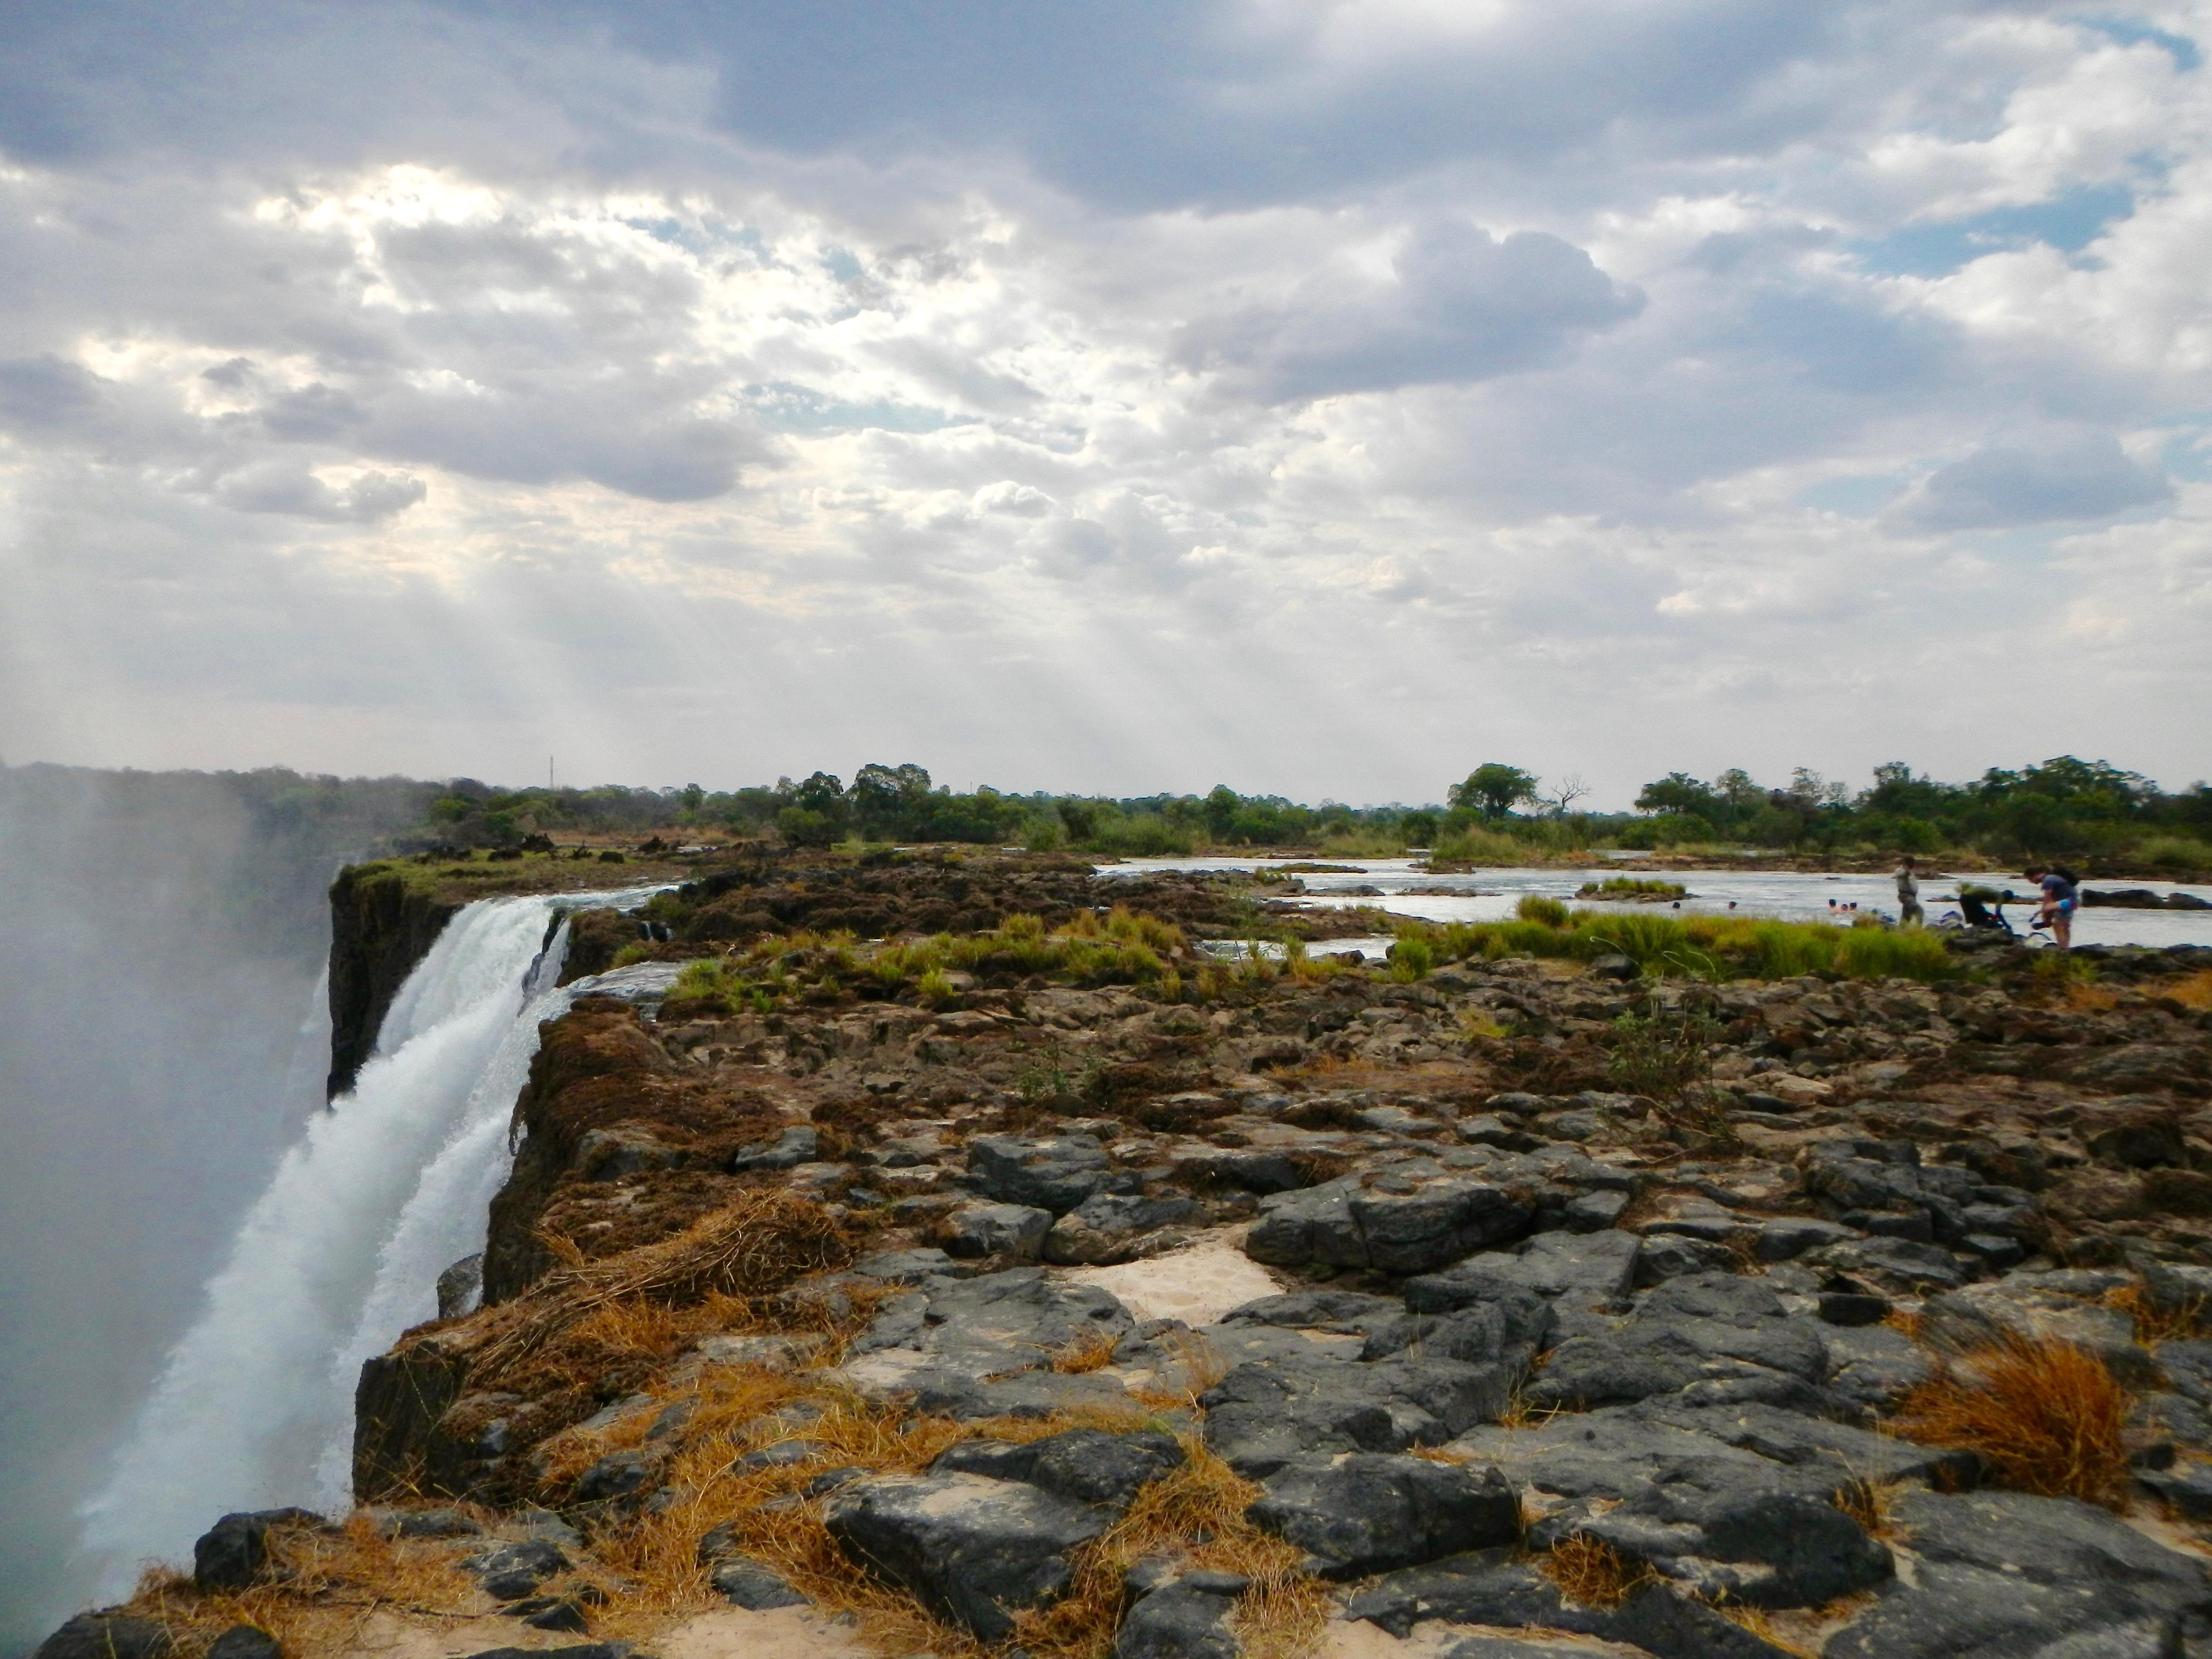 Atractii Circuit de grup Rwanda & Uganda & - februarie - Eturia Agentie de turism